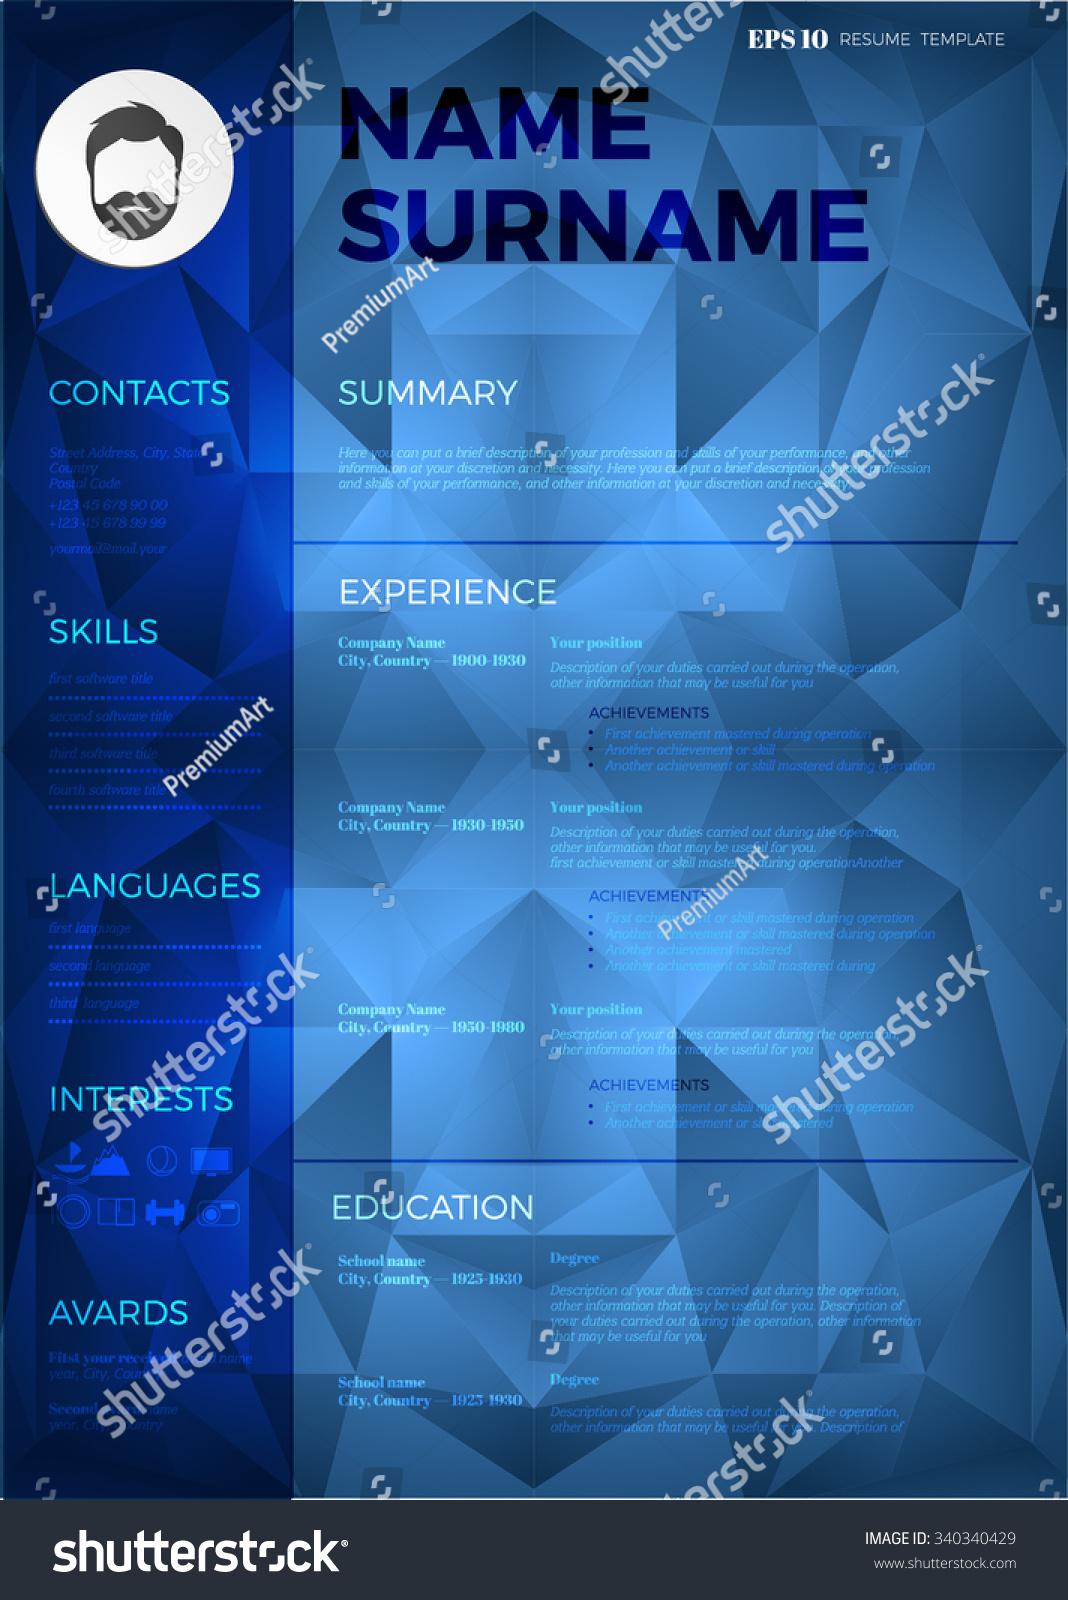 Ctrl Z Resume. linux suspend resume ctrl z. ctrl z and fg on vimgifs ...